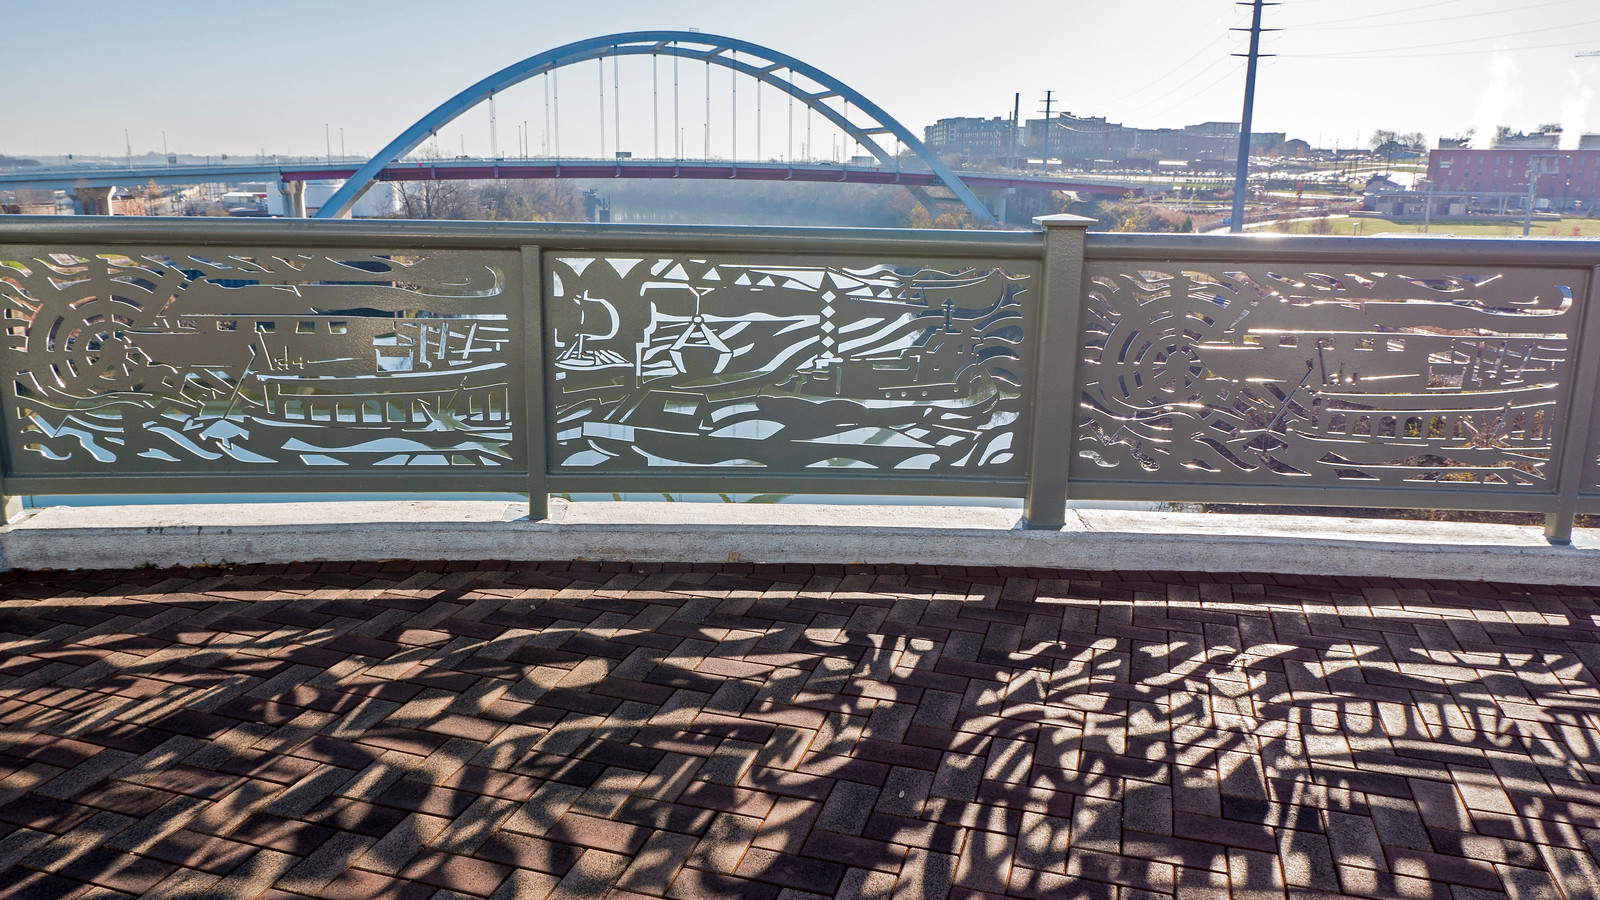 Things to Do in Nashville - John Seigenthaler Pedestrian Bridge to Cumberland Park